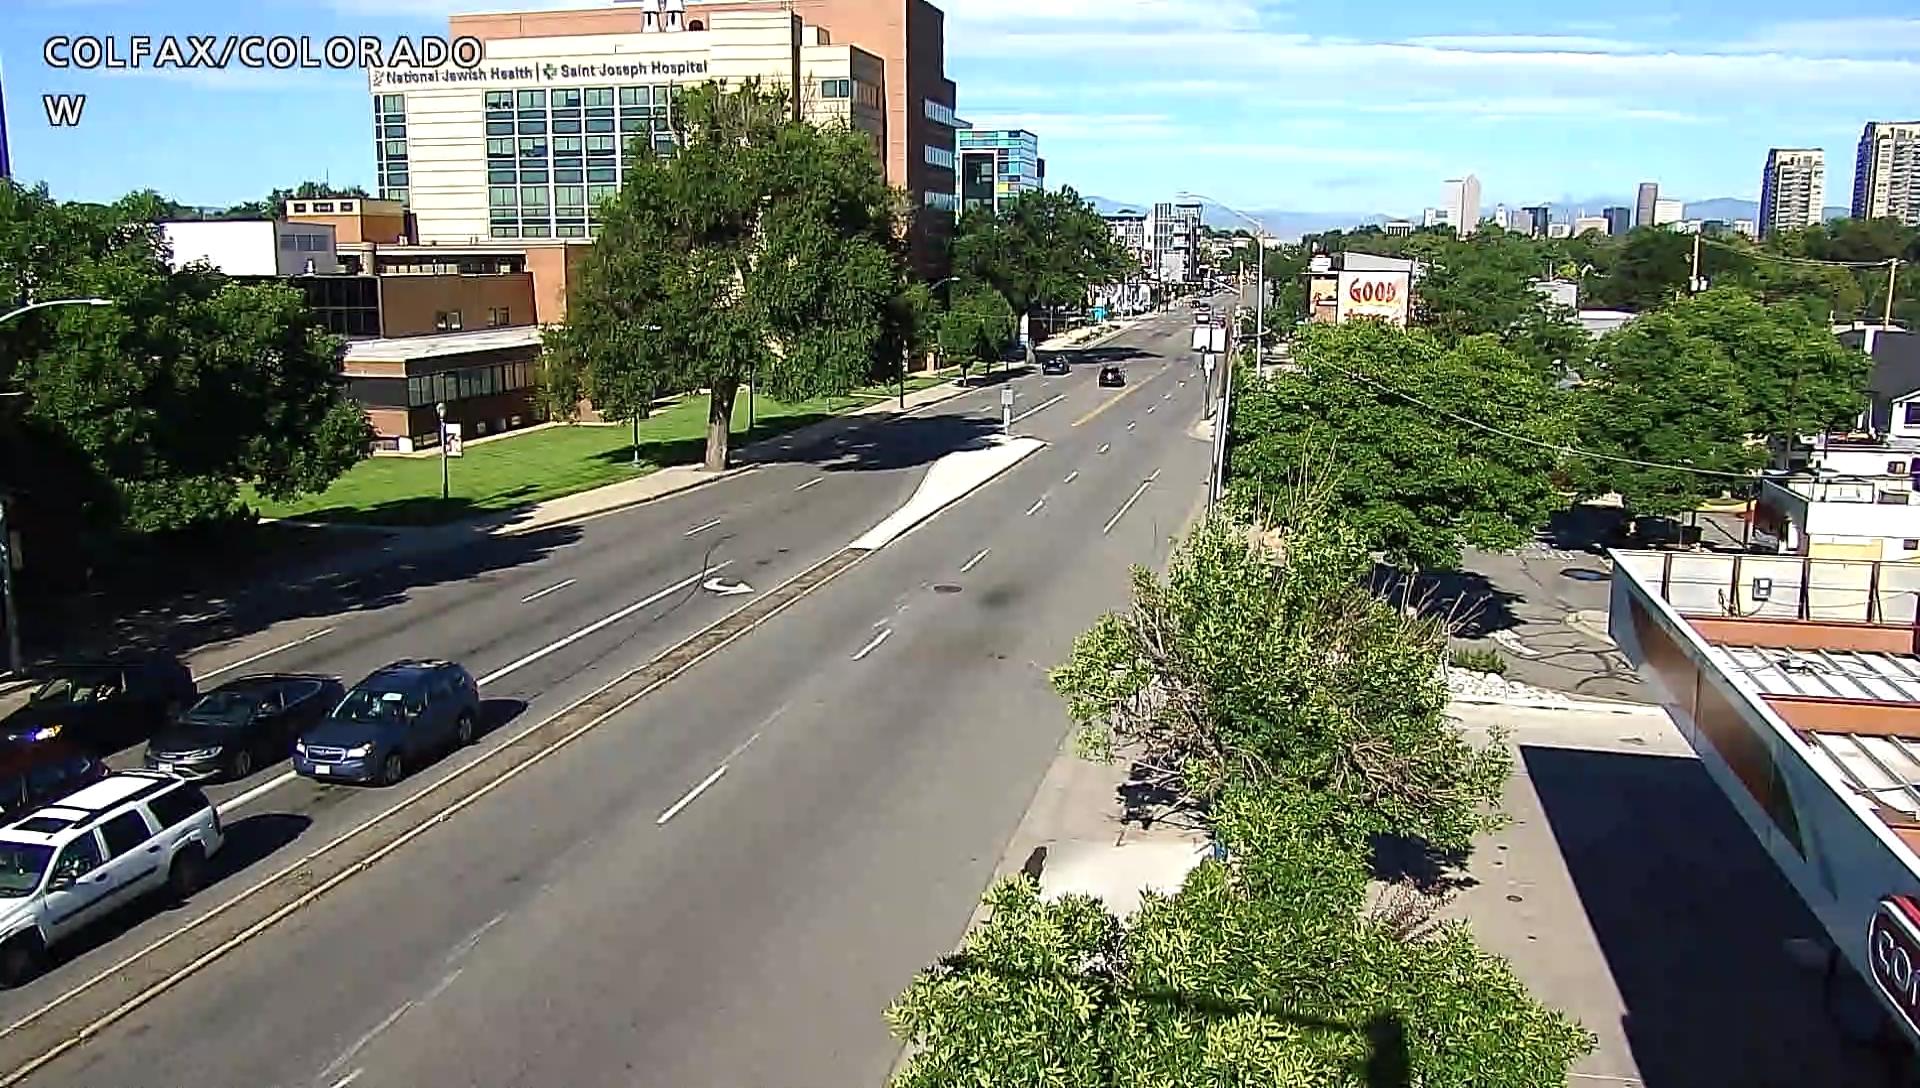 Colorado Boulevard and Colfax Avenue